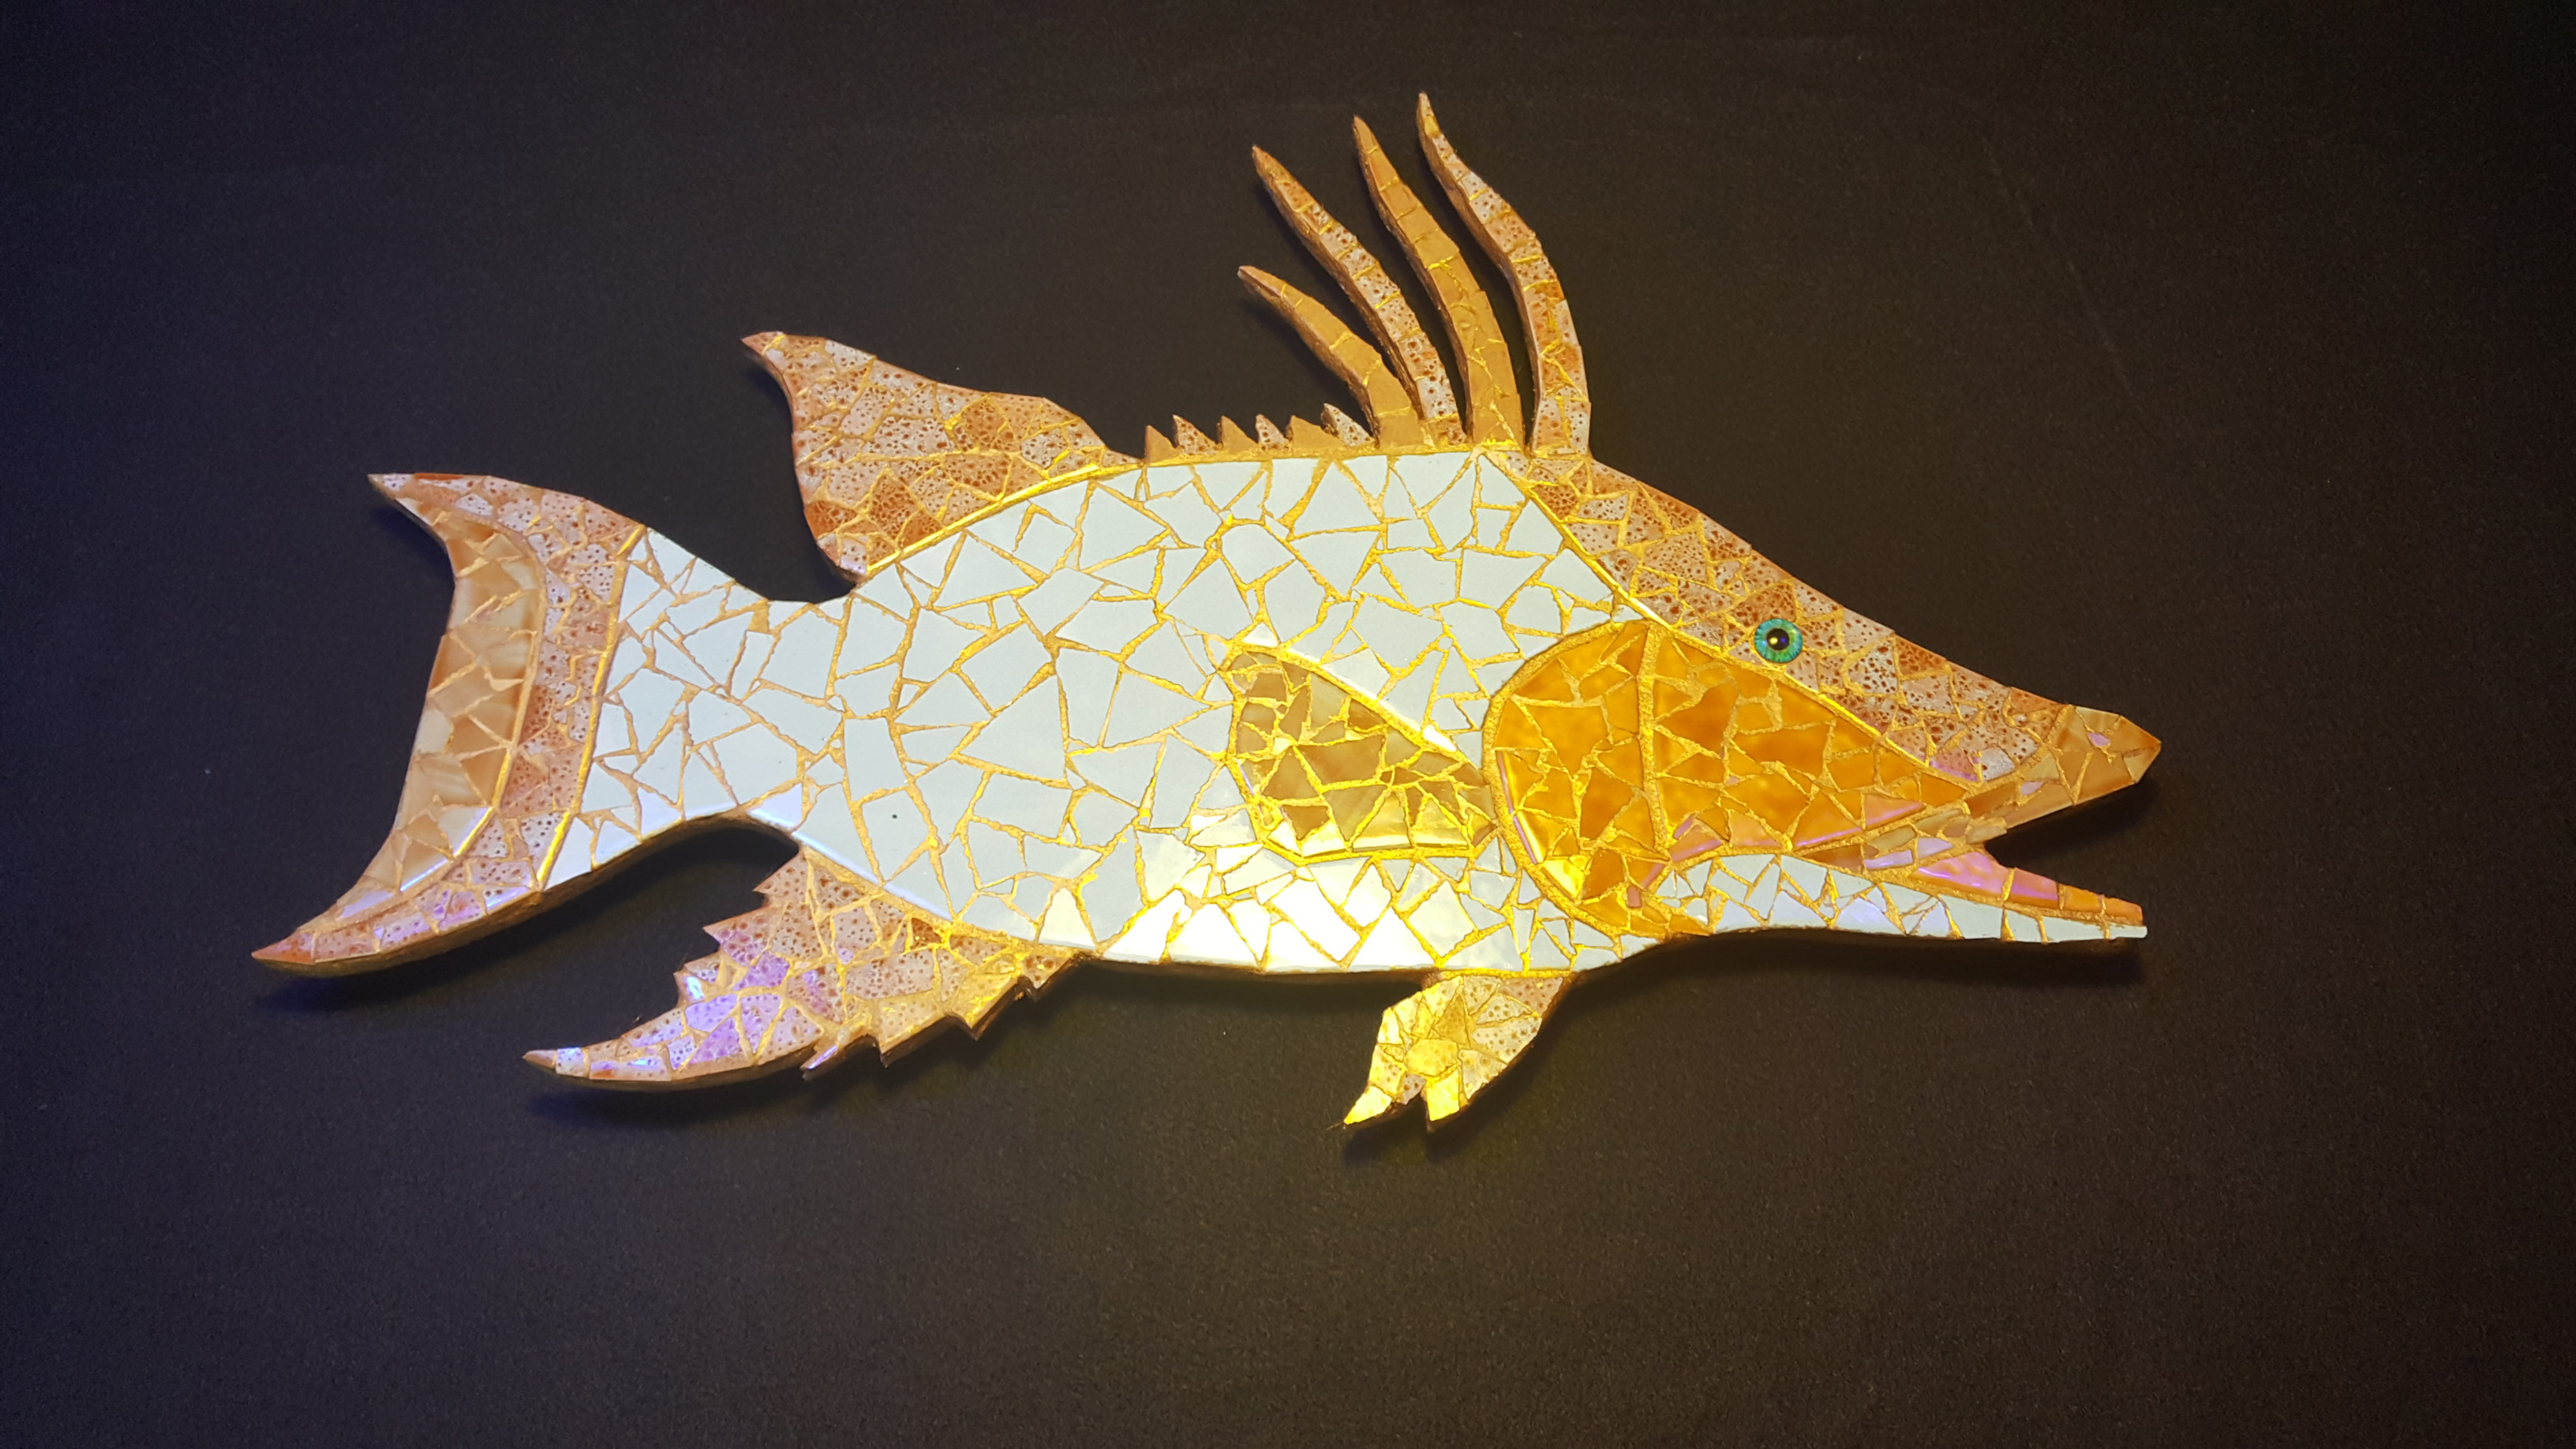 Hogfish - Medium